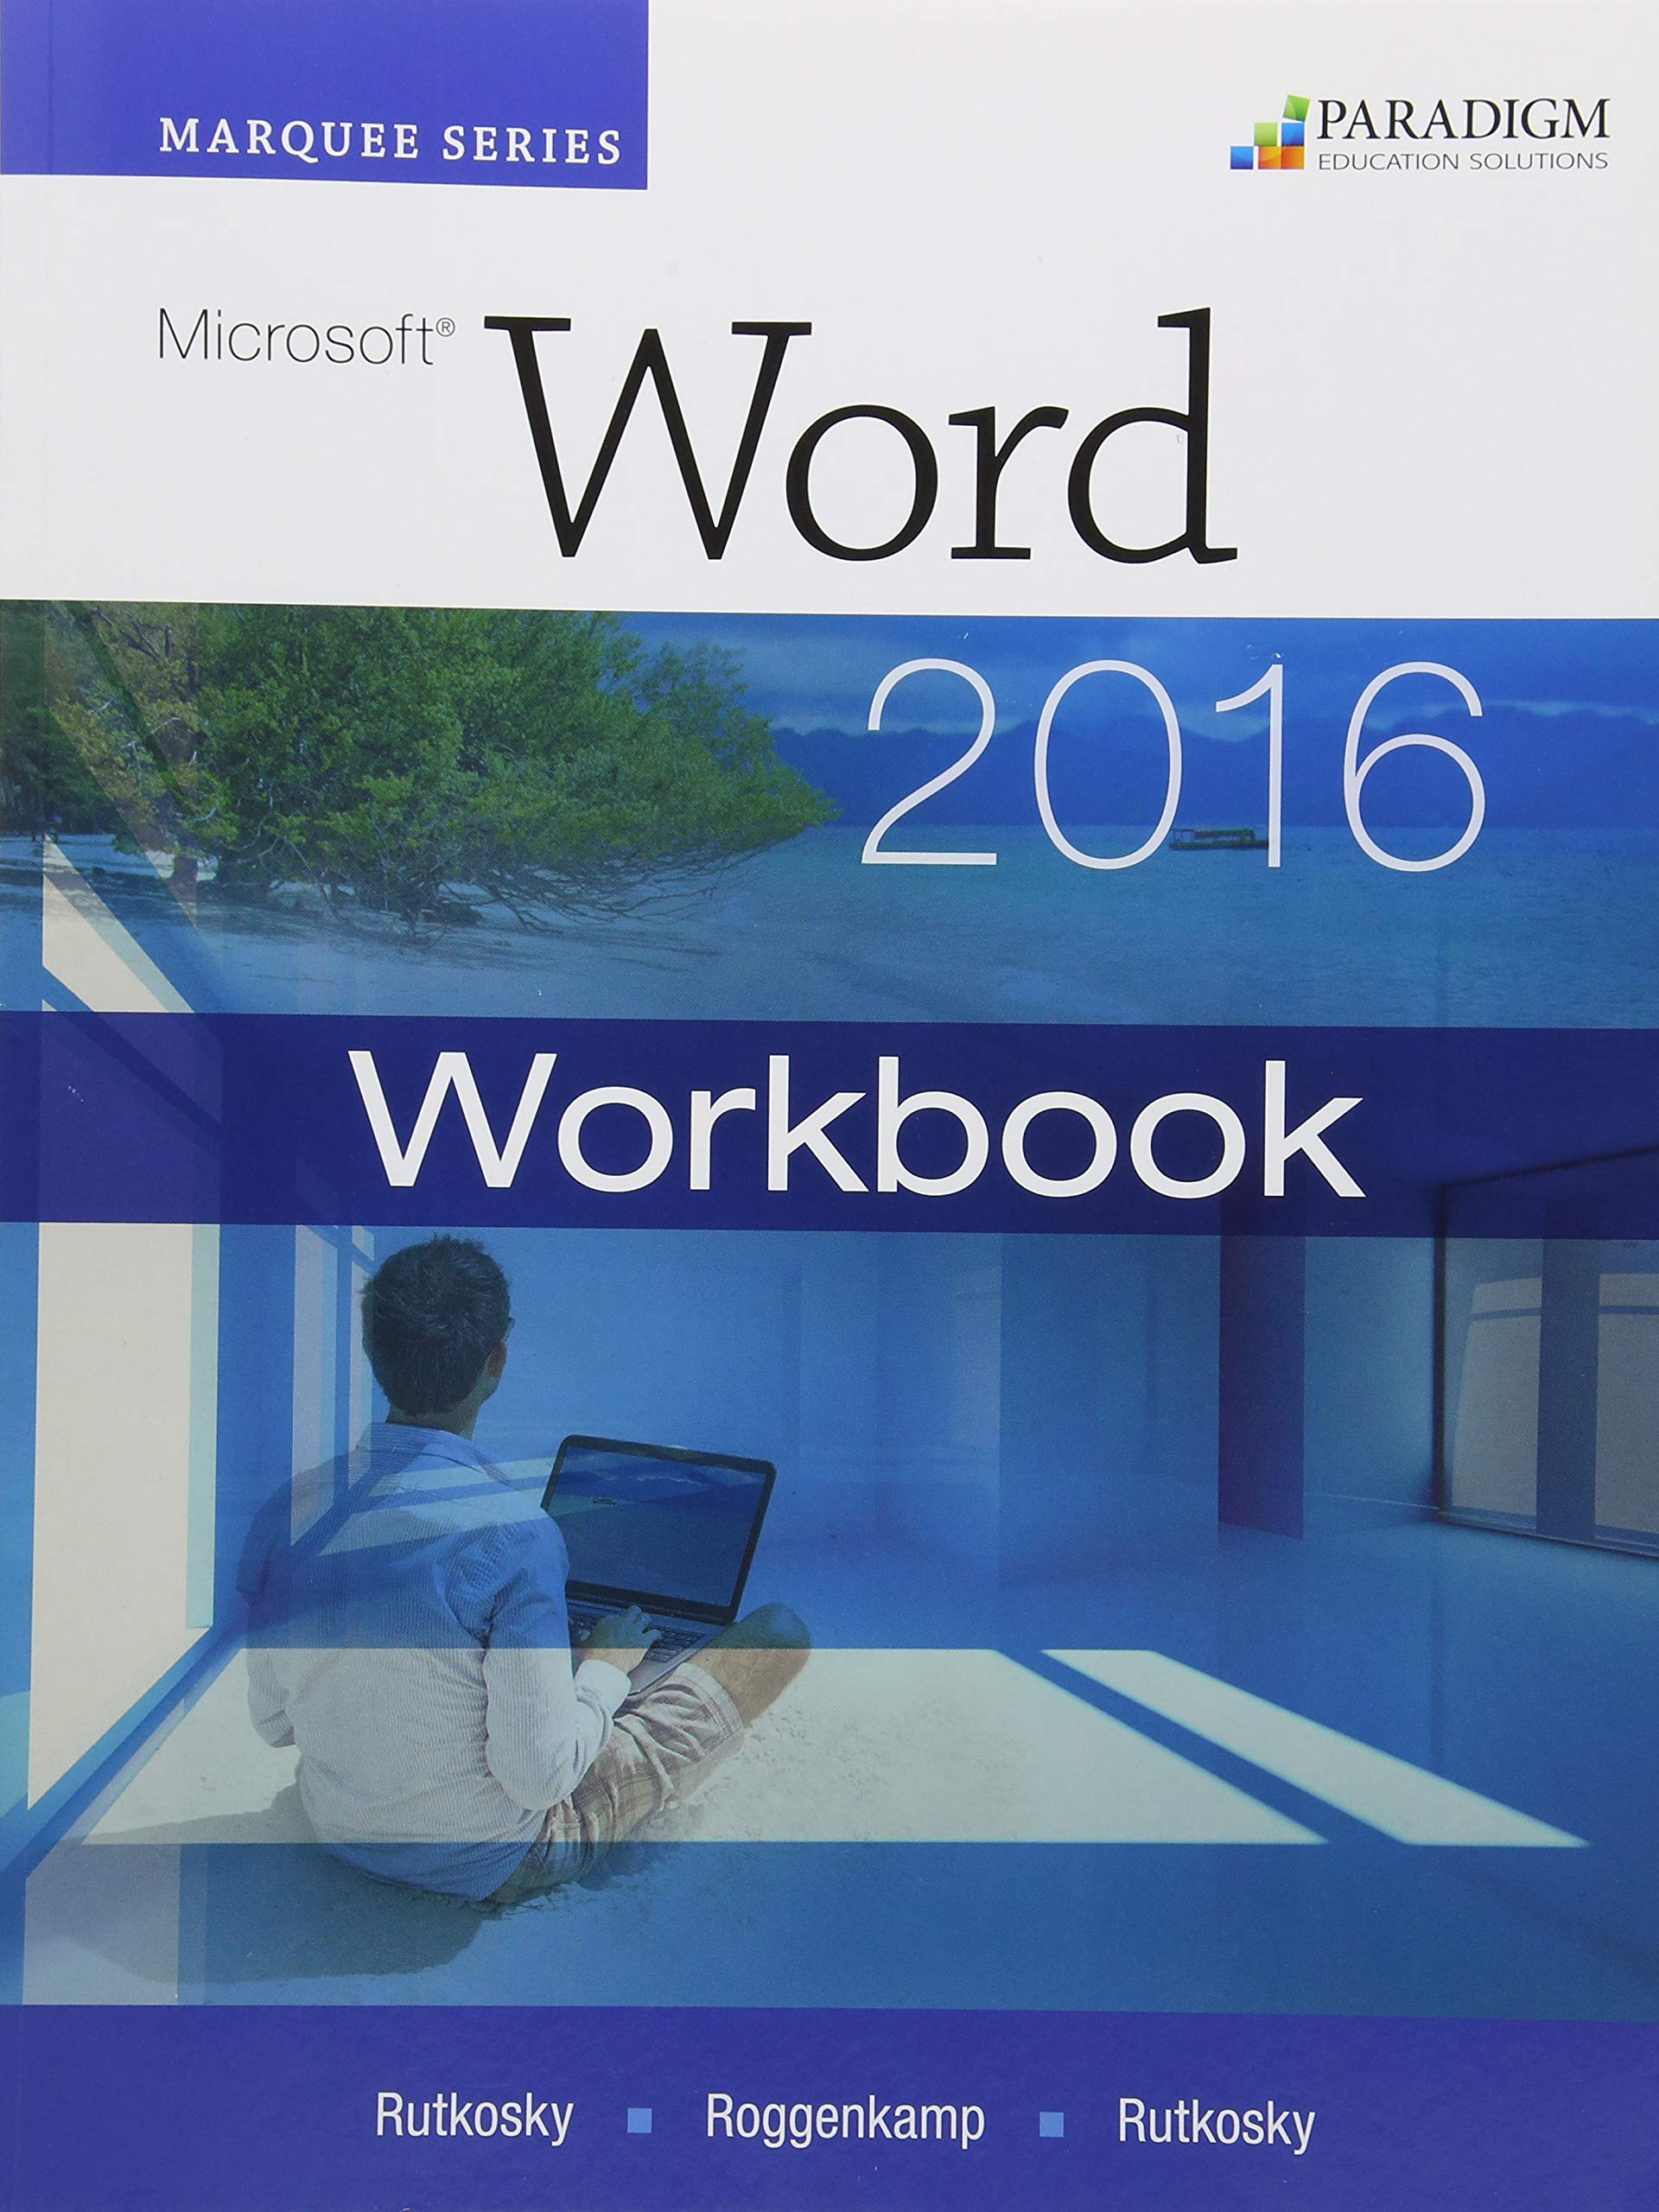 Download Marquee Series: Microsoft (R)Word 2016: Workbook pdf